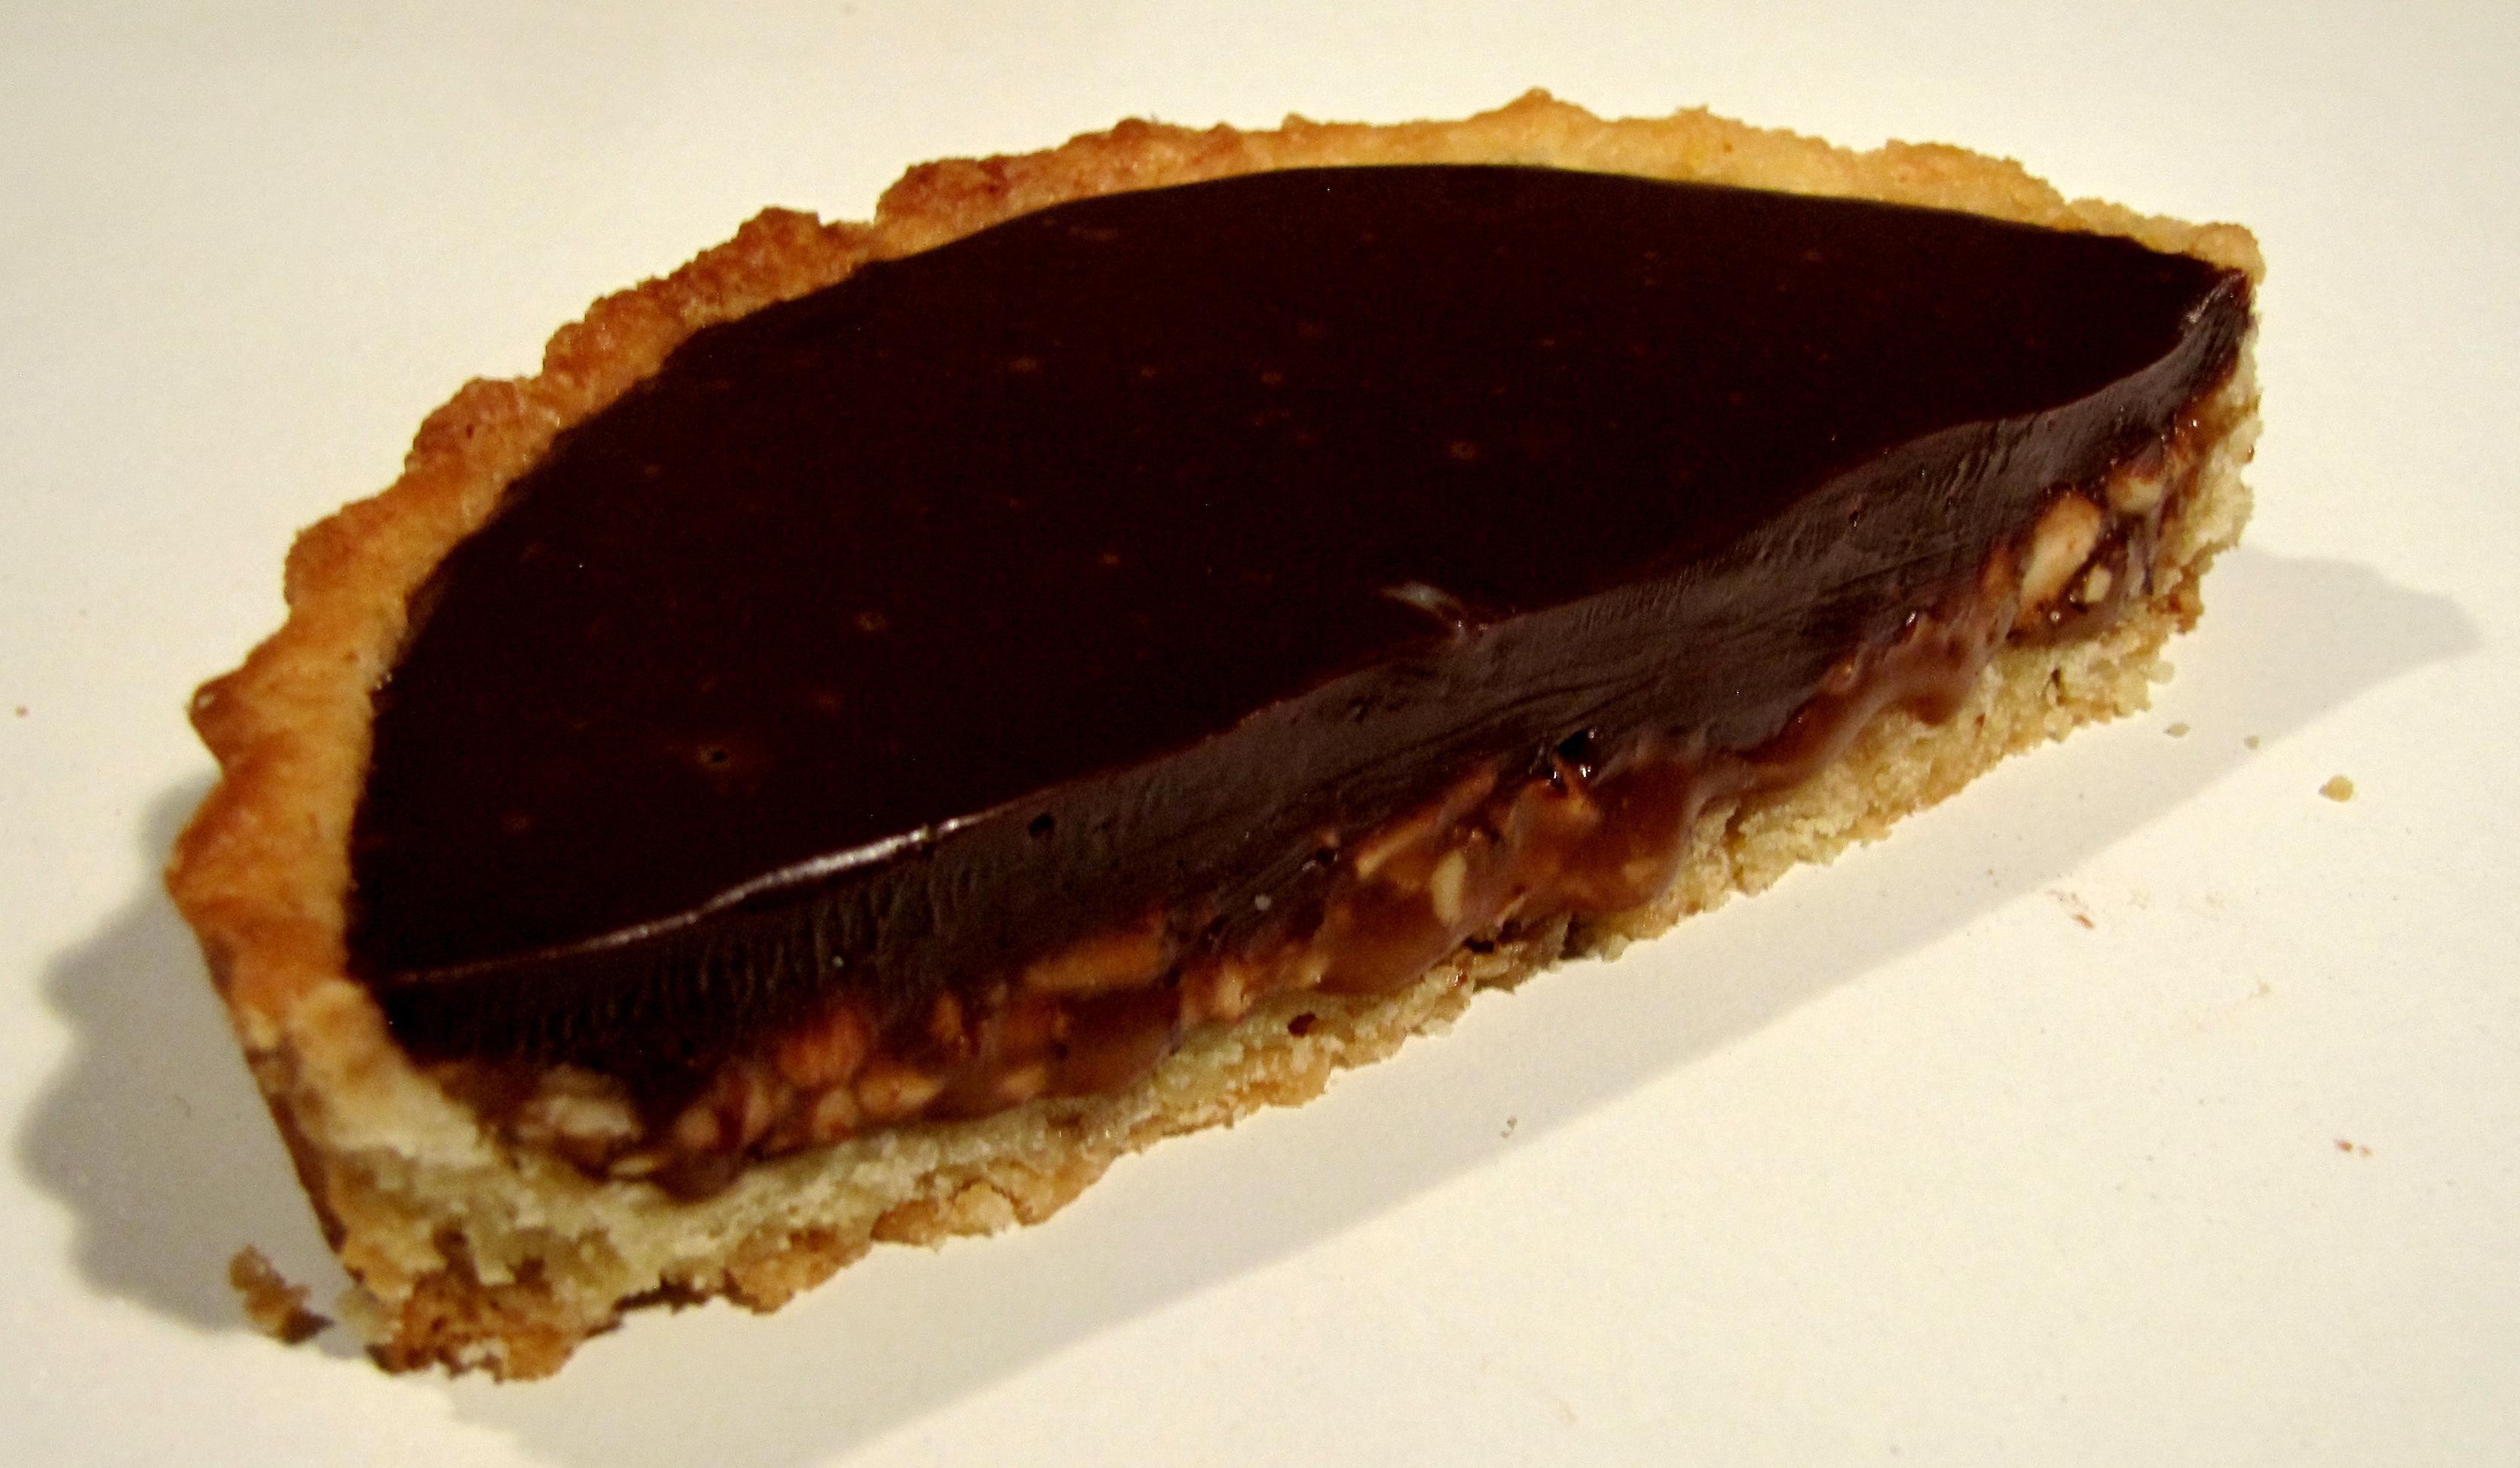 Chocolate Caramel Hazelnut Tart | Bake-a-tron